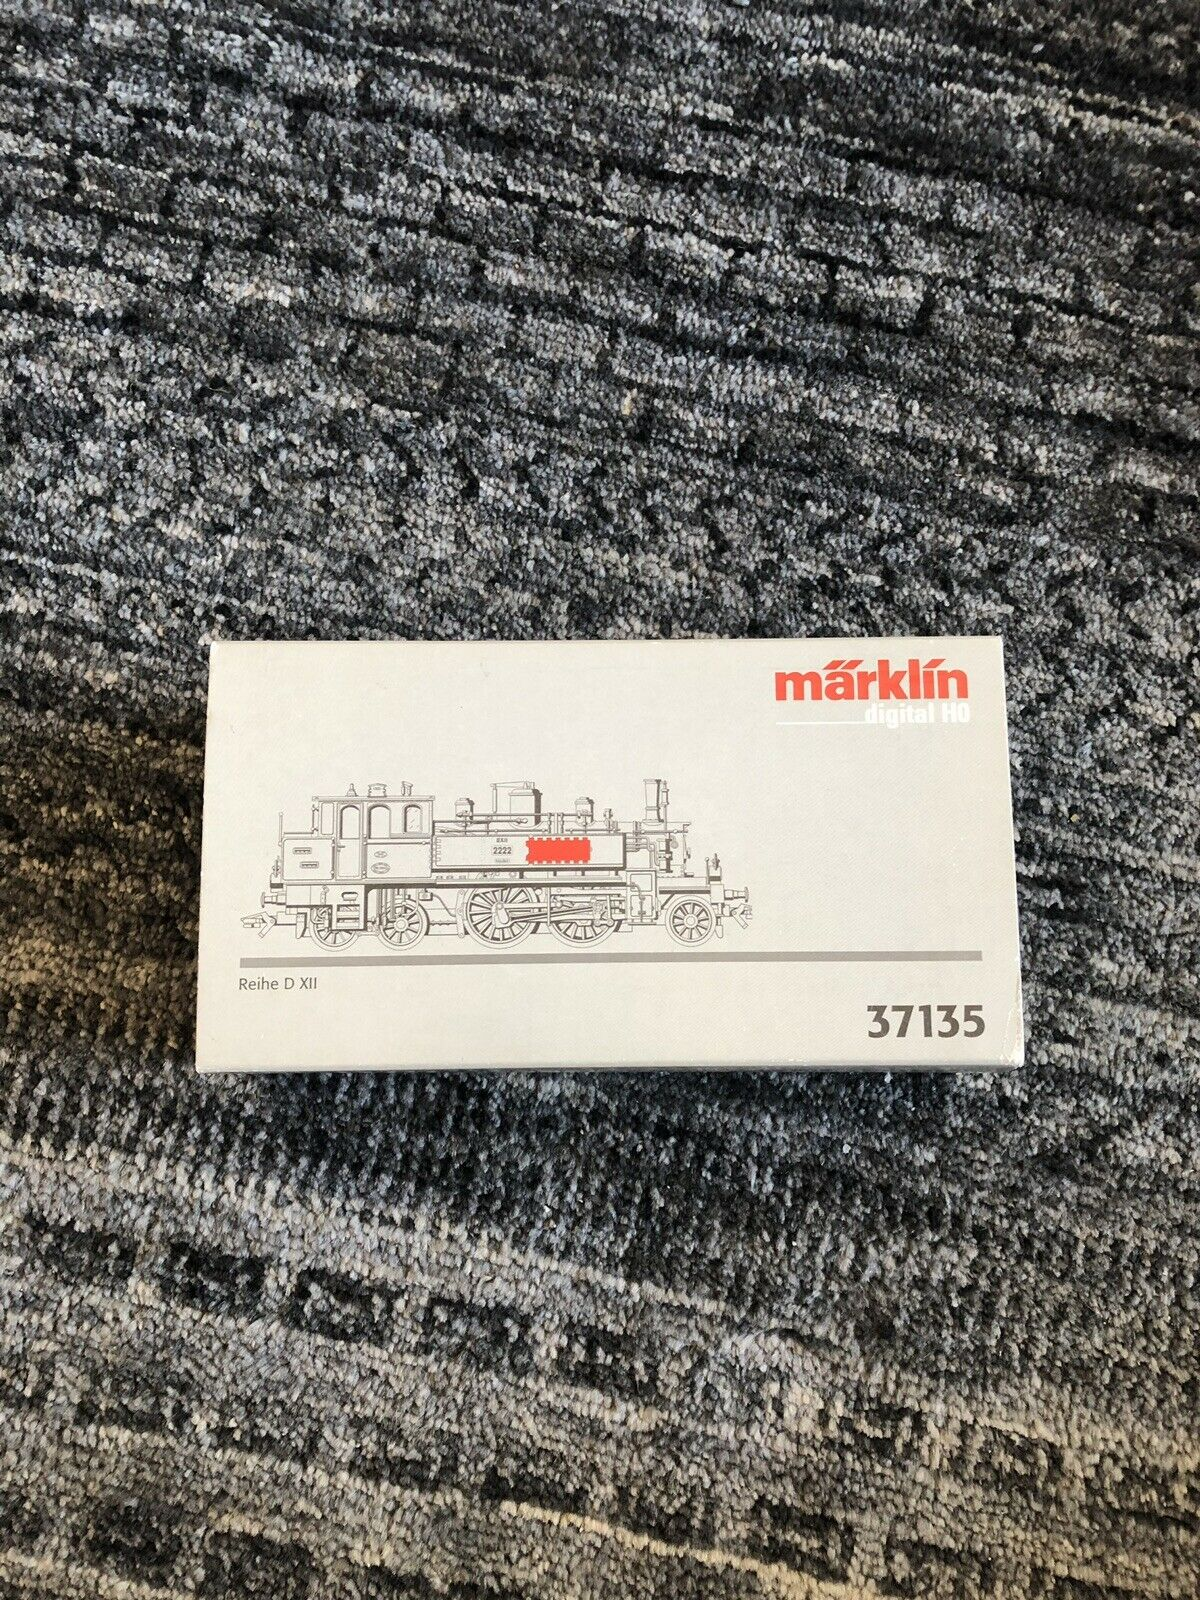 vendita online marklin train. Digital Digital Digital HO. Reihe D XII 37135  bellissima